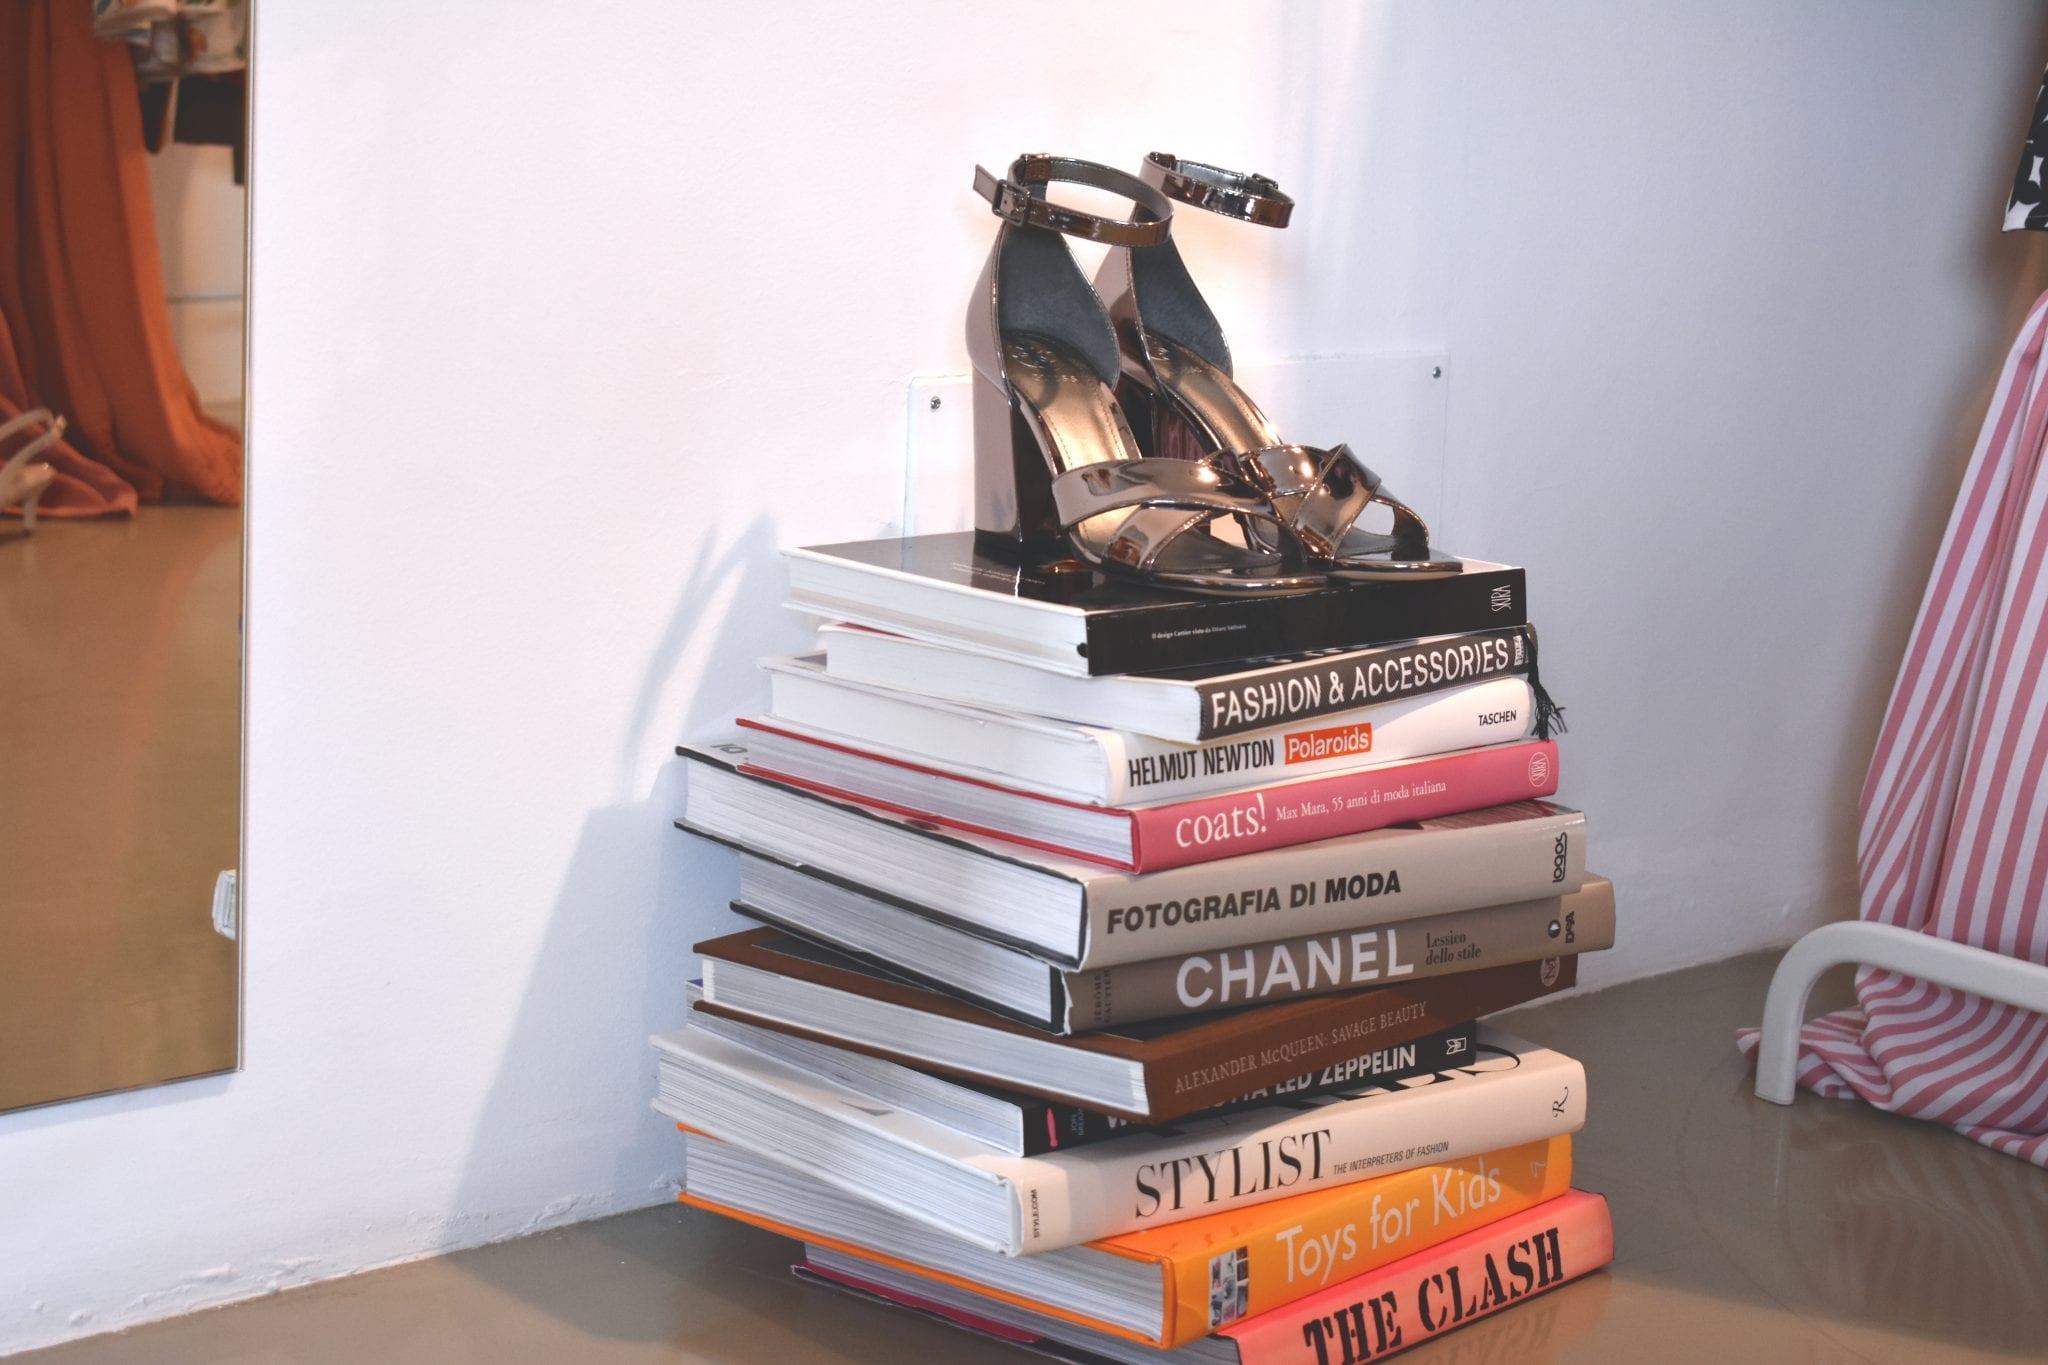 scarpe Murales fashi/off - LePlume